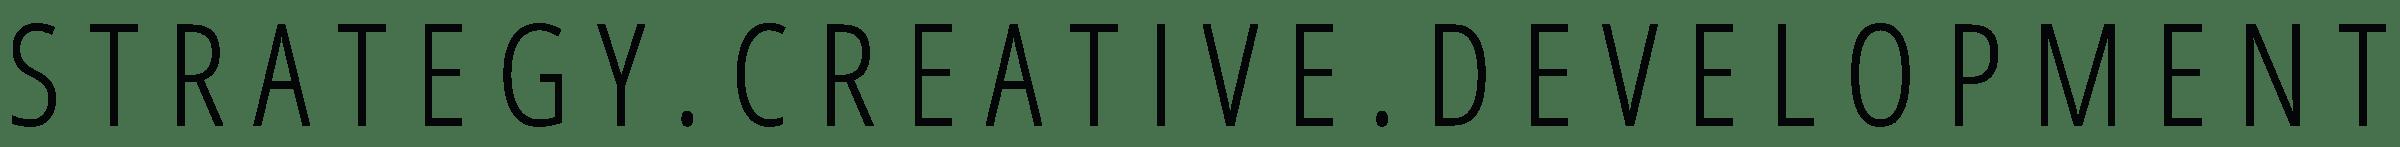 STRATEGY . CREATIVE . DEVELOPMENT | Vervocity